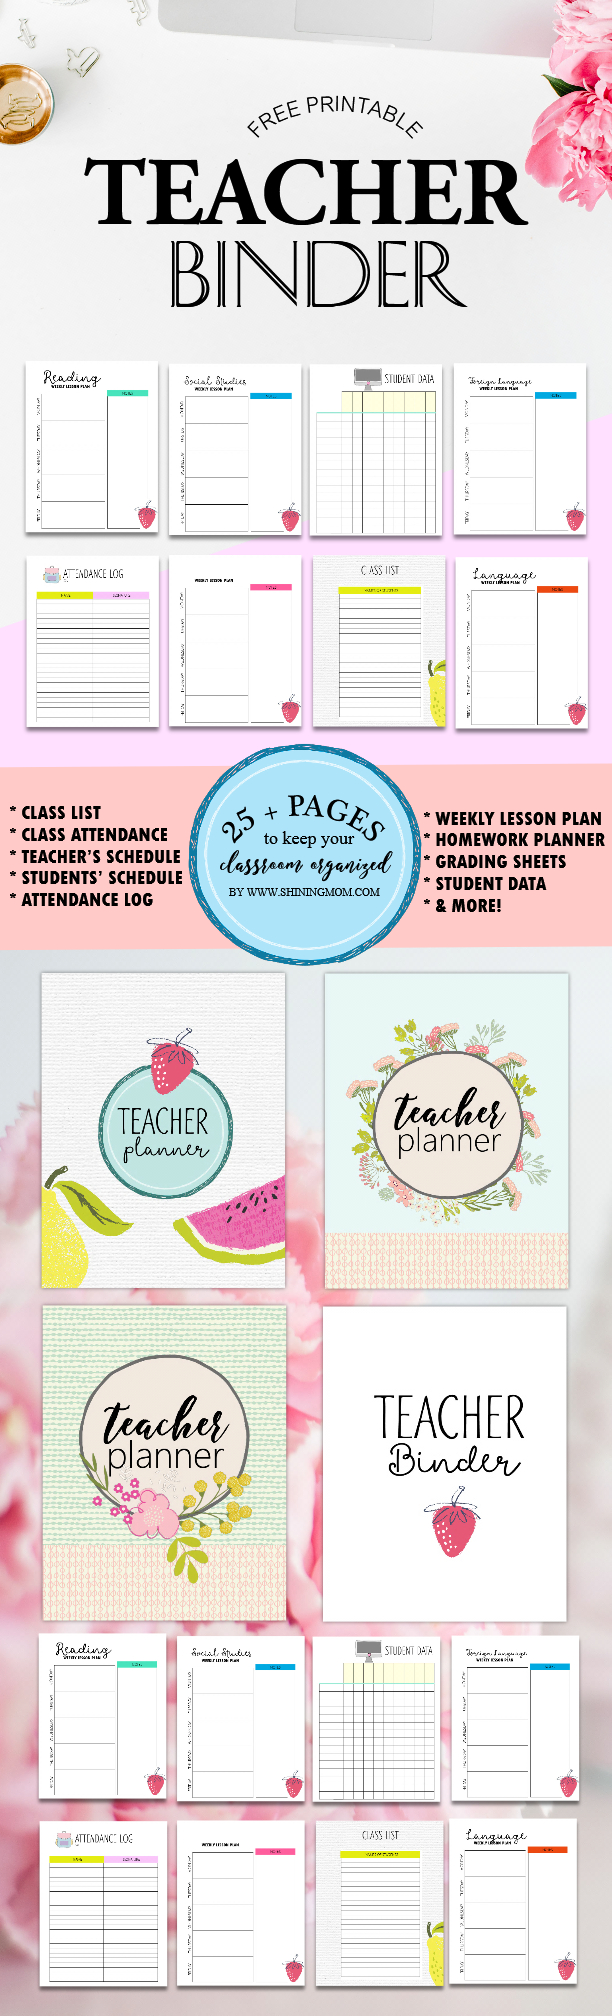 Free Teacher Binder Printables: Over 25 Pretty Planning Templates! - Free Printable Teacher Binder Covers